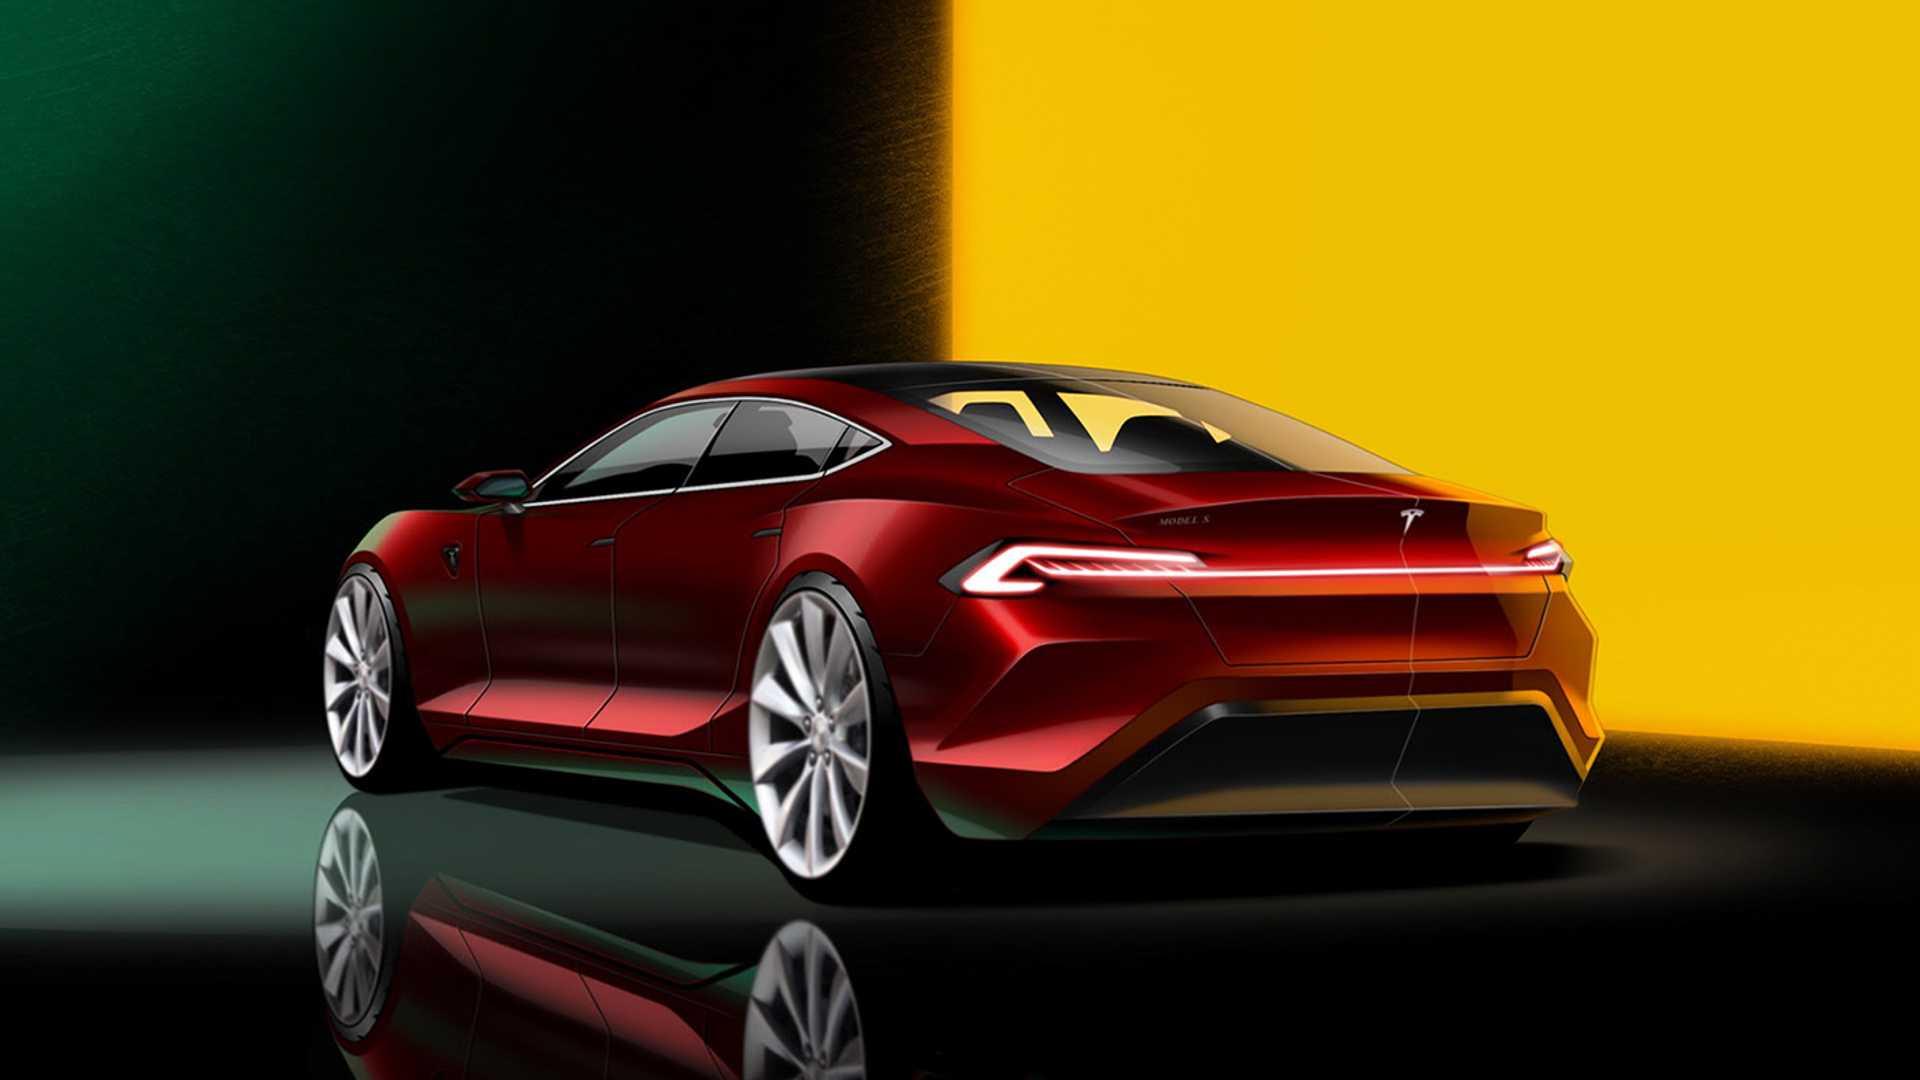 Tesla Model S rendering